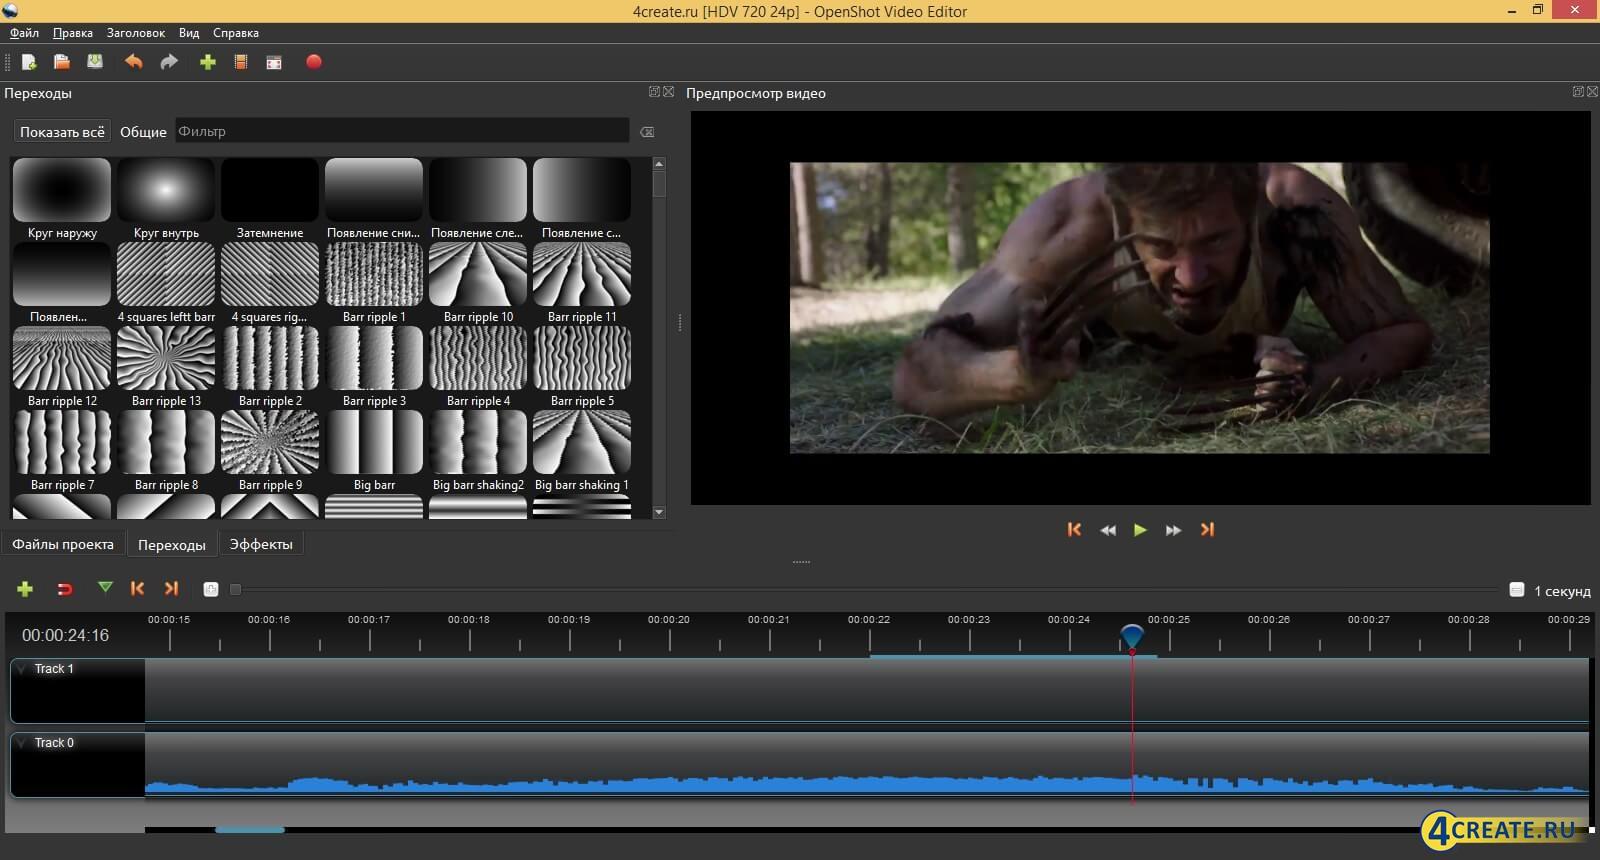 OpenShot Video Editor 2.2 (Скриншот 3)